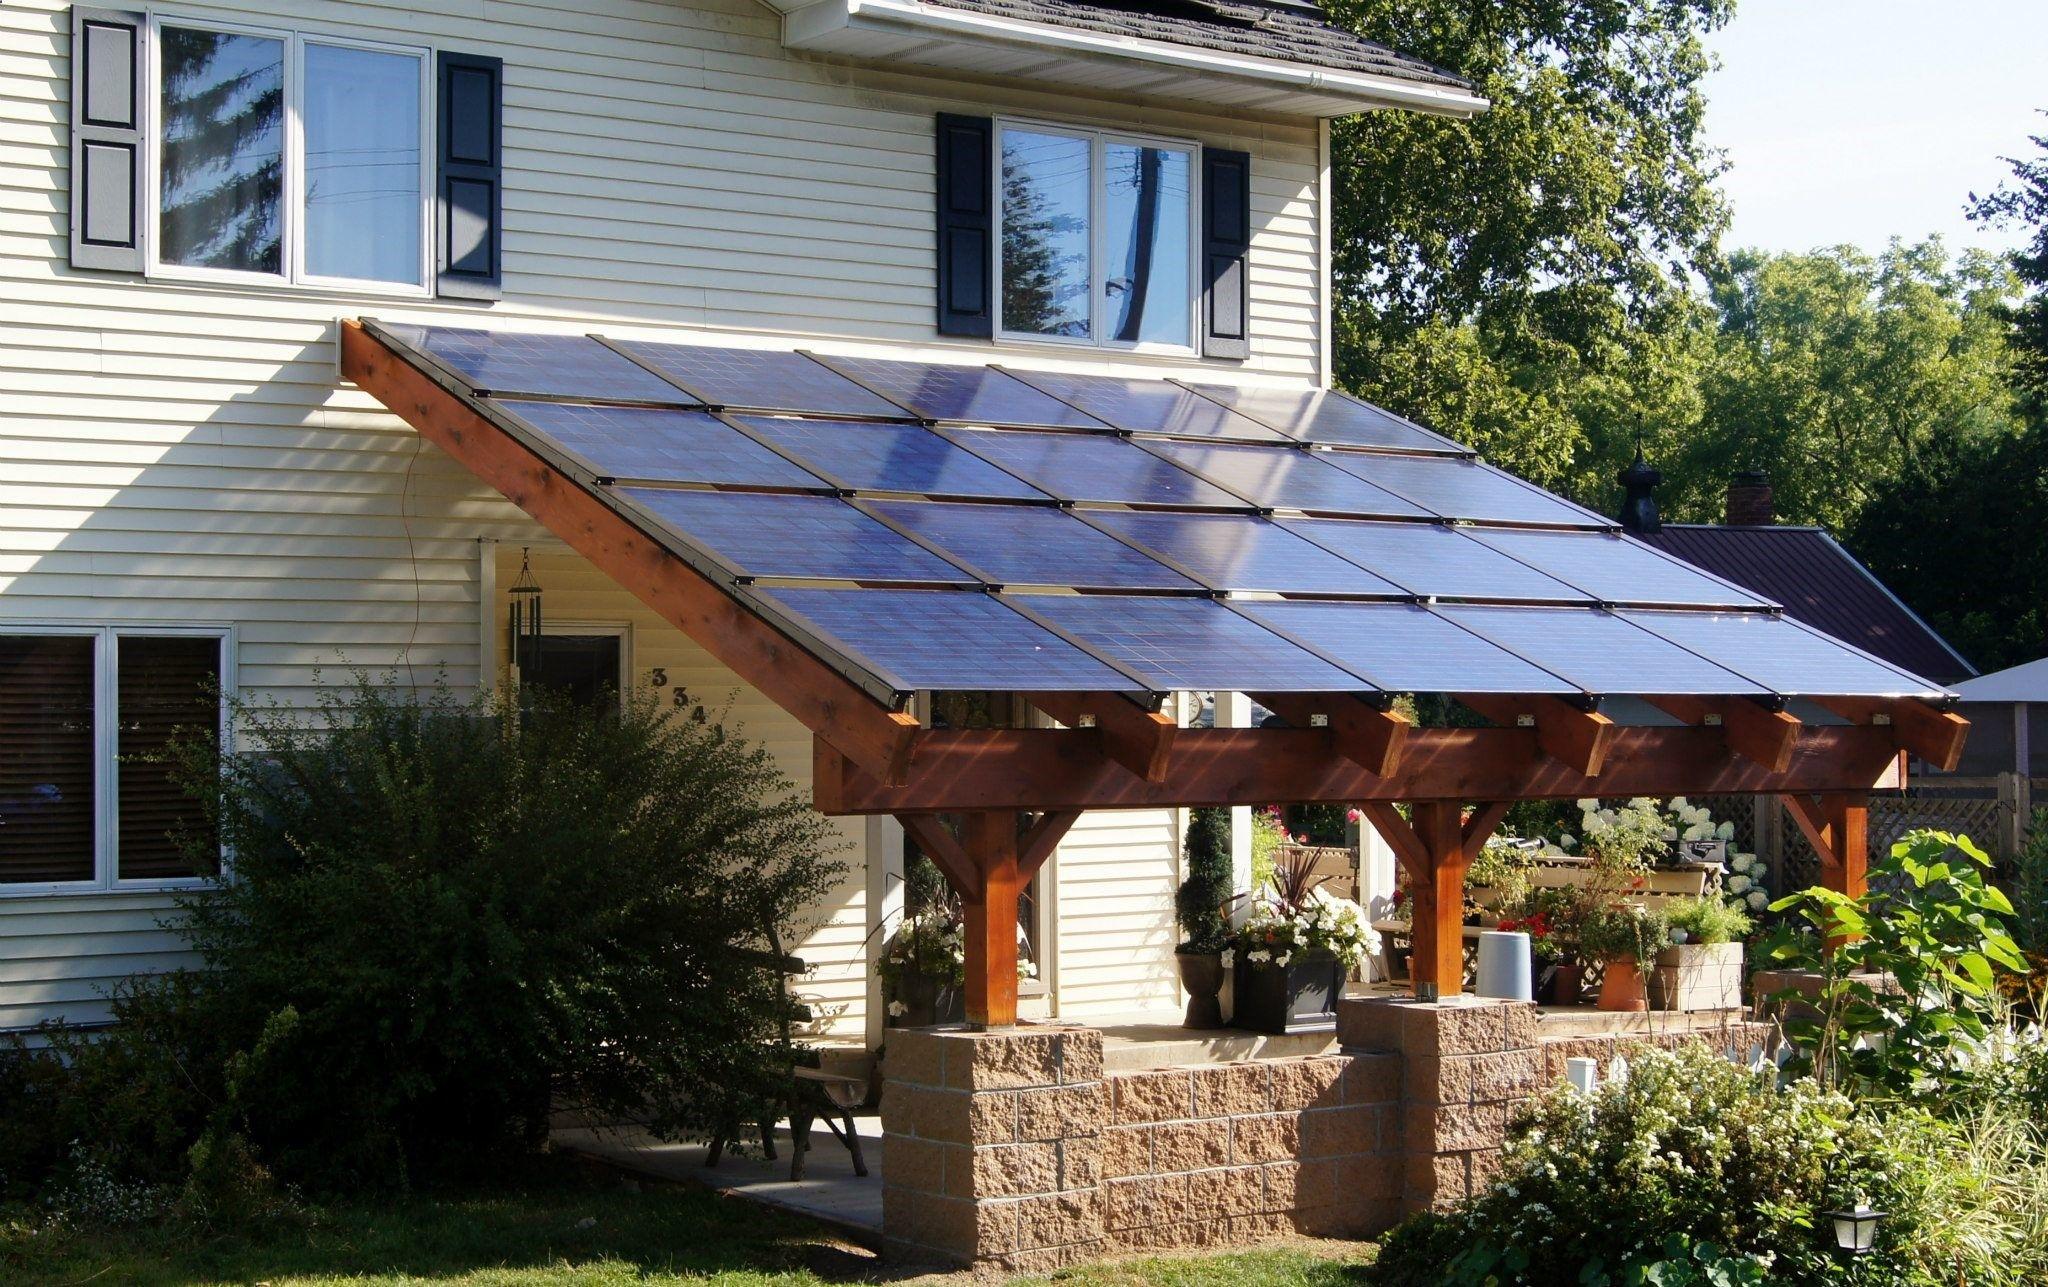 Blue Horizon Energy Solar Carport 3 8kw Of Silicon Energy Cascade Pv Modules Solar Patio Solar Panels Solar Panels For Home